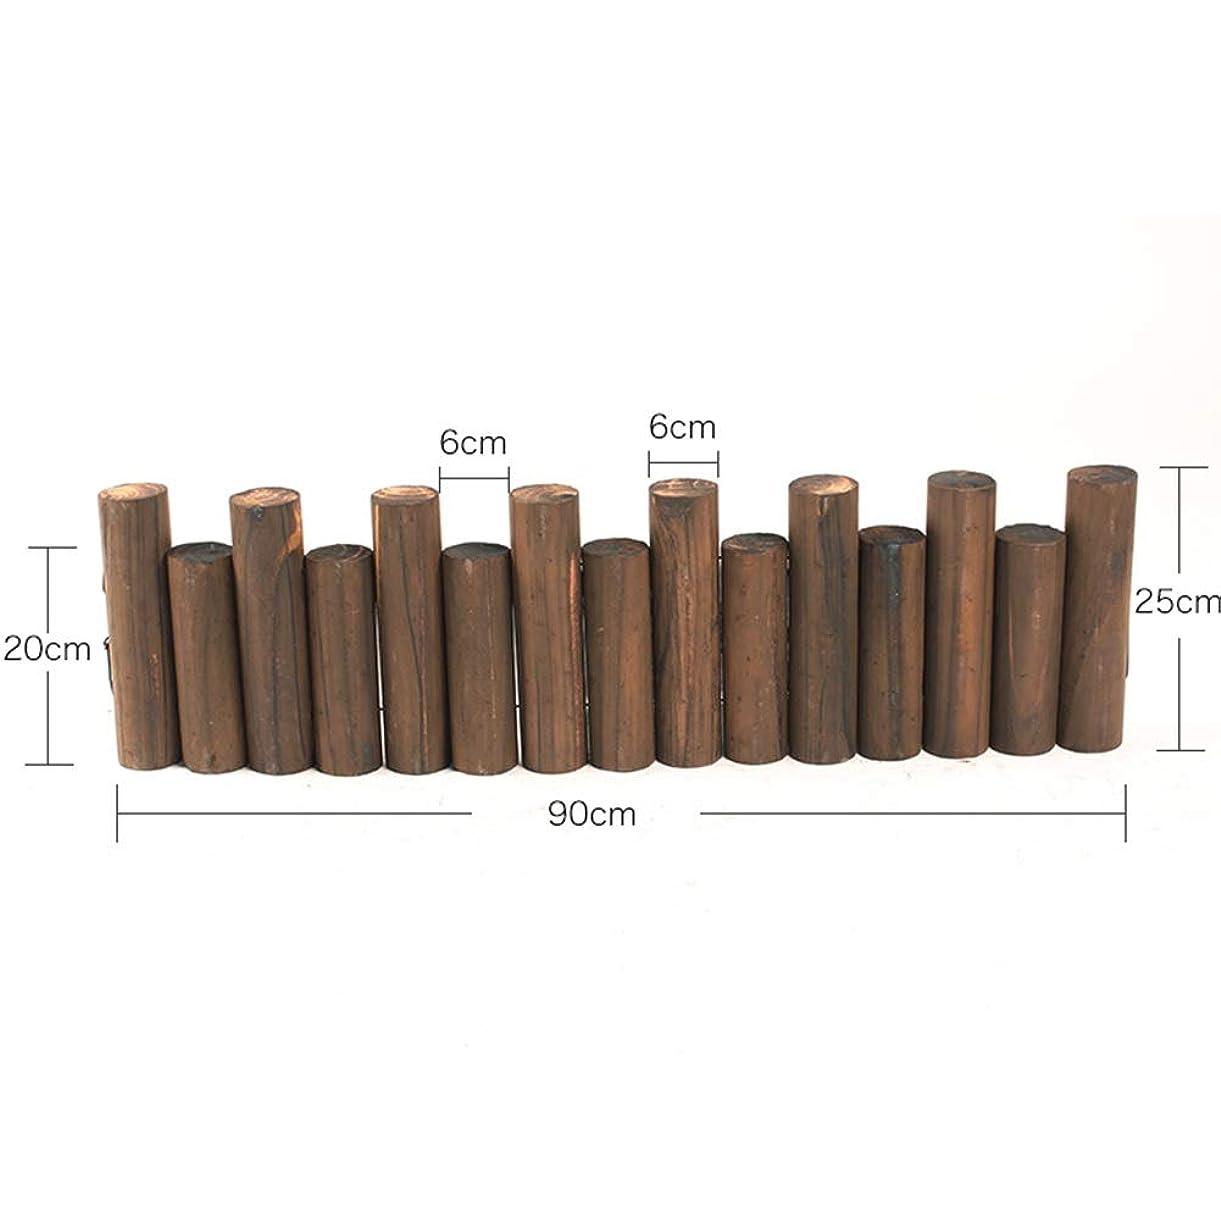 JIANFEI 木製 ボーダーフェンス ガードレール アウトドアデコレーション 風景 防水 パインウッド 、9つのサイズ 、タイプ2 (色 : 1pcs, サイズ さいず : 90x25cm)